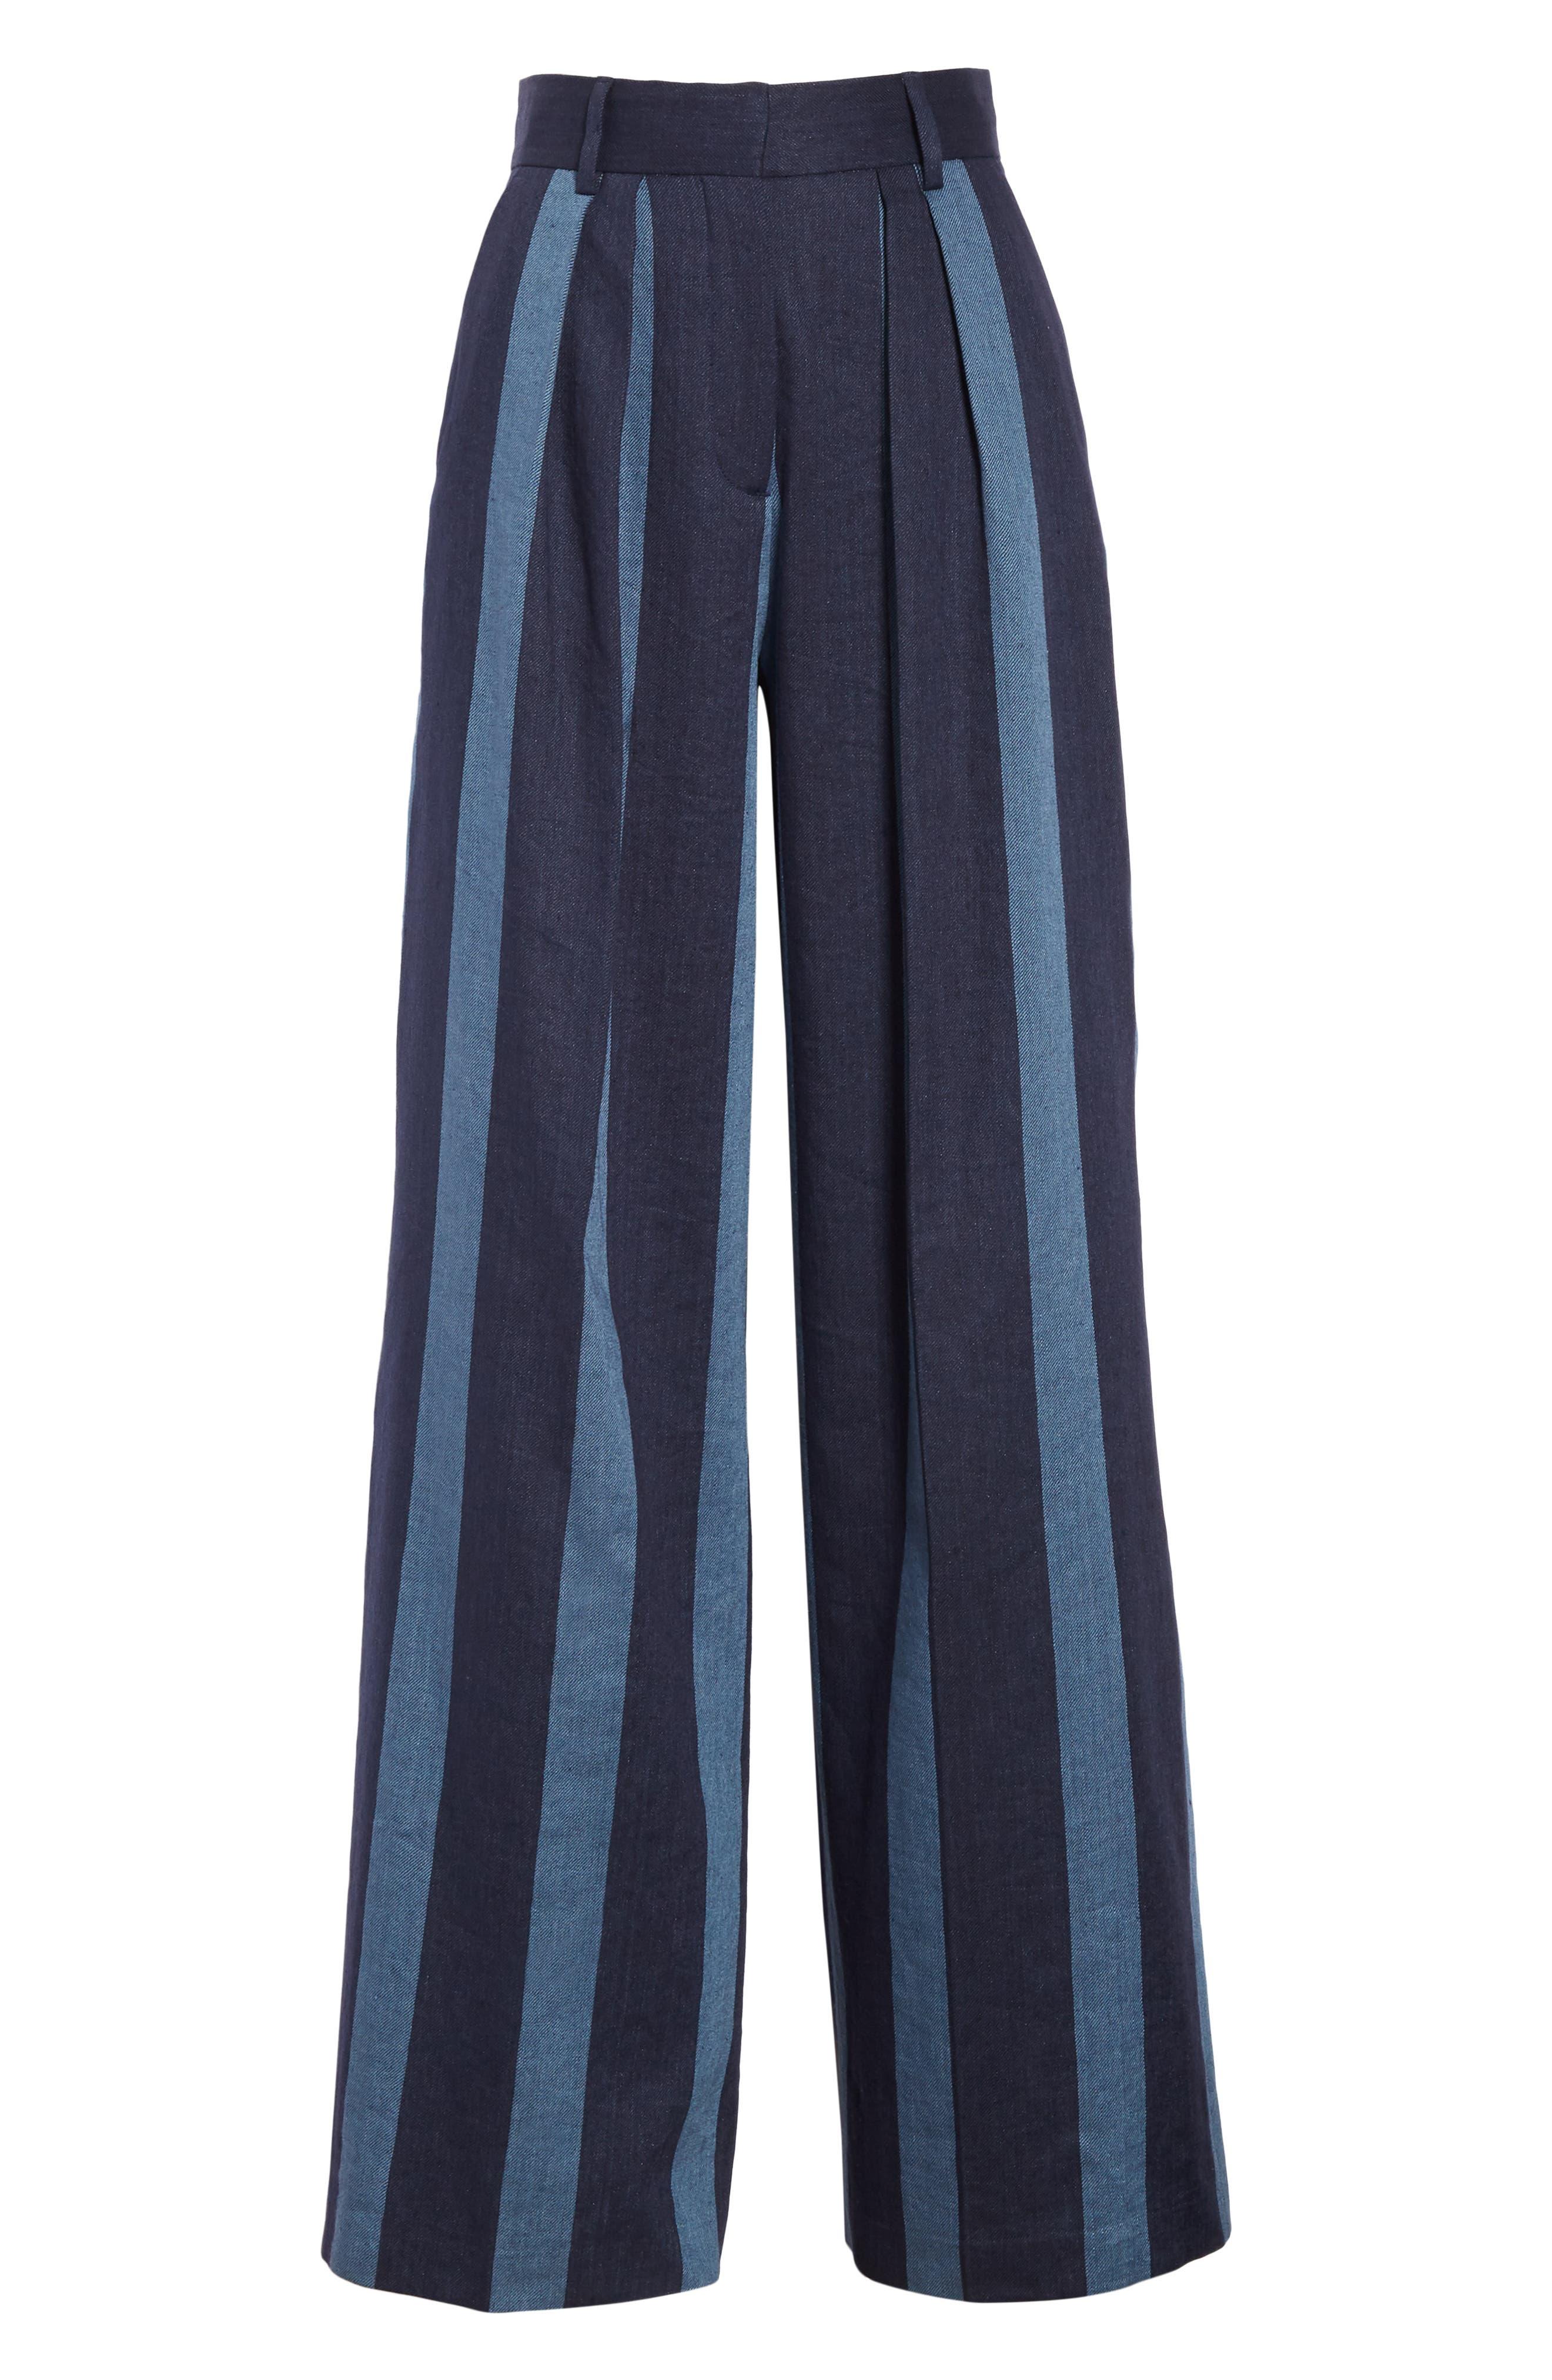 TOMMY X ZENDAYA, Stripe Denim Pants, Alternate thumbnail 7, color, STRIPED DENIM